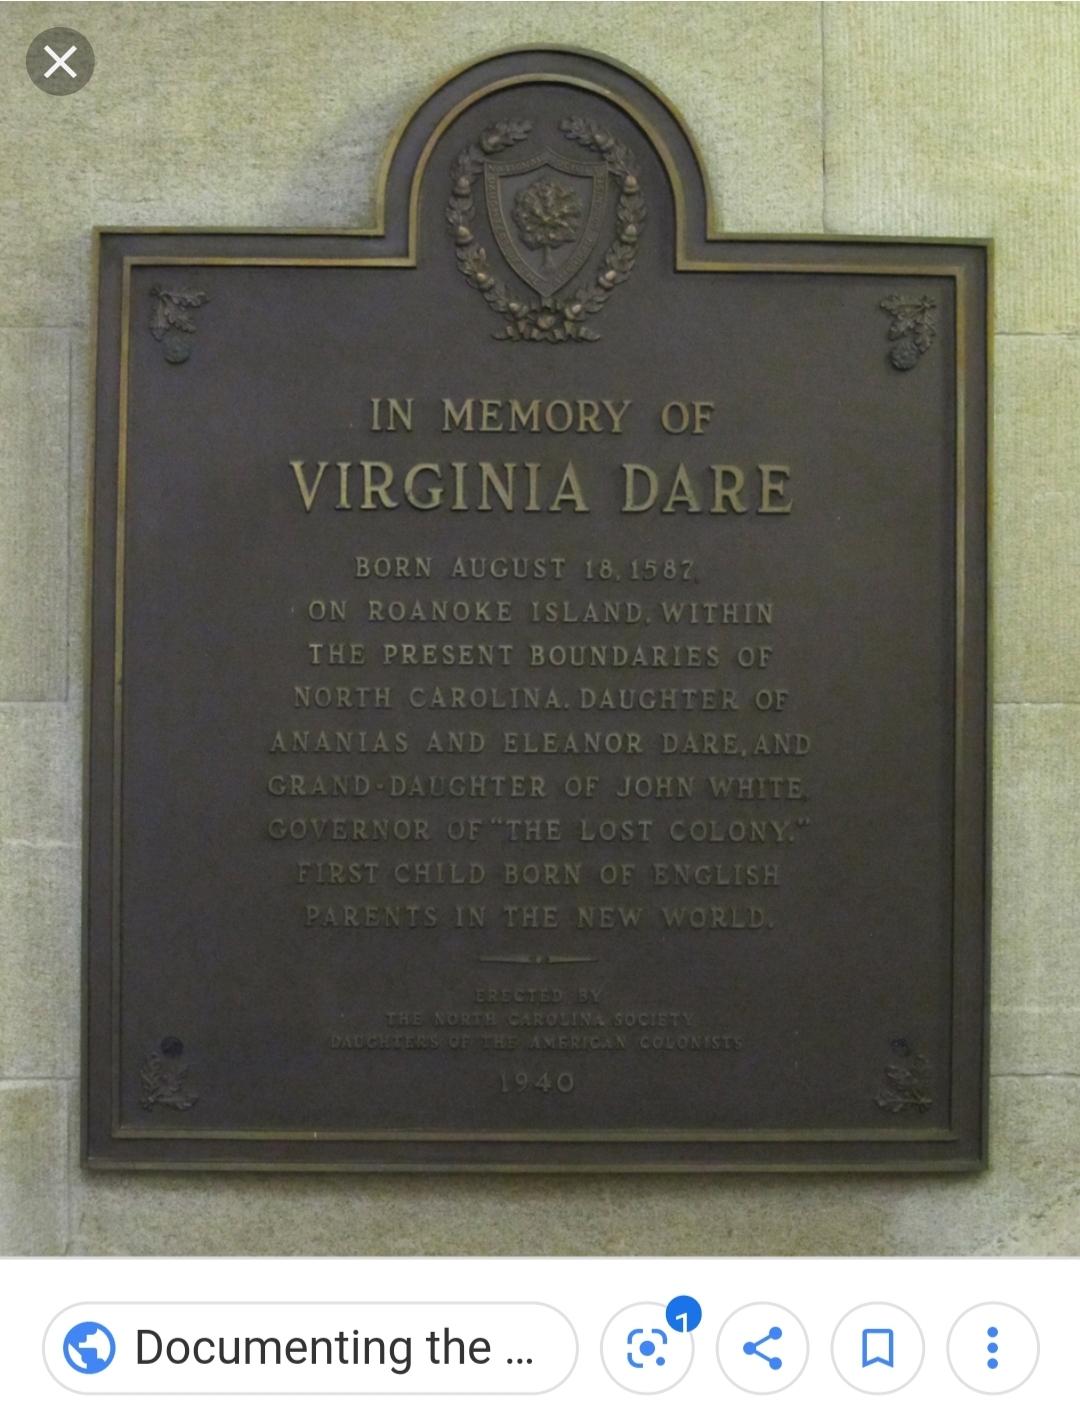 Memorial Plaque for Virginia